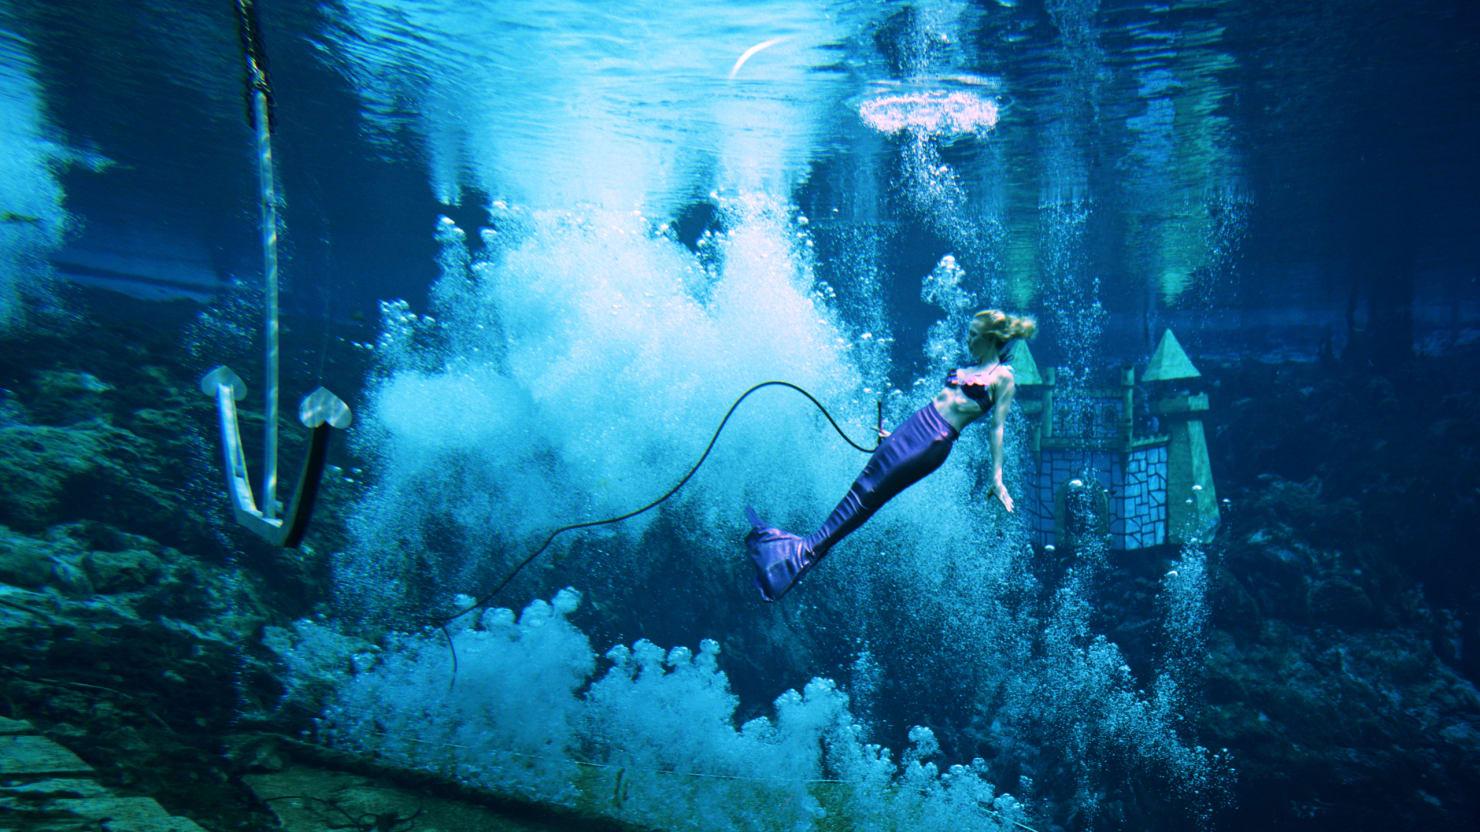 The World S Craziest Underwater Adventures